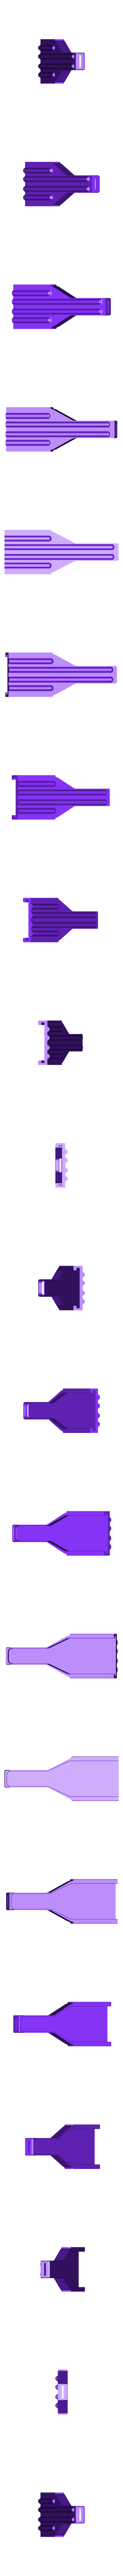 MAG_BASE_X.stl Download free STL file Zombie Slayer (5 SHOT MAG) • 3D printer template, MuSSy